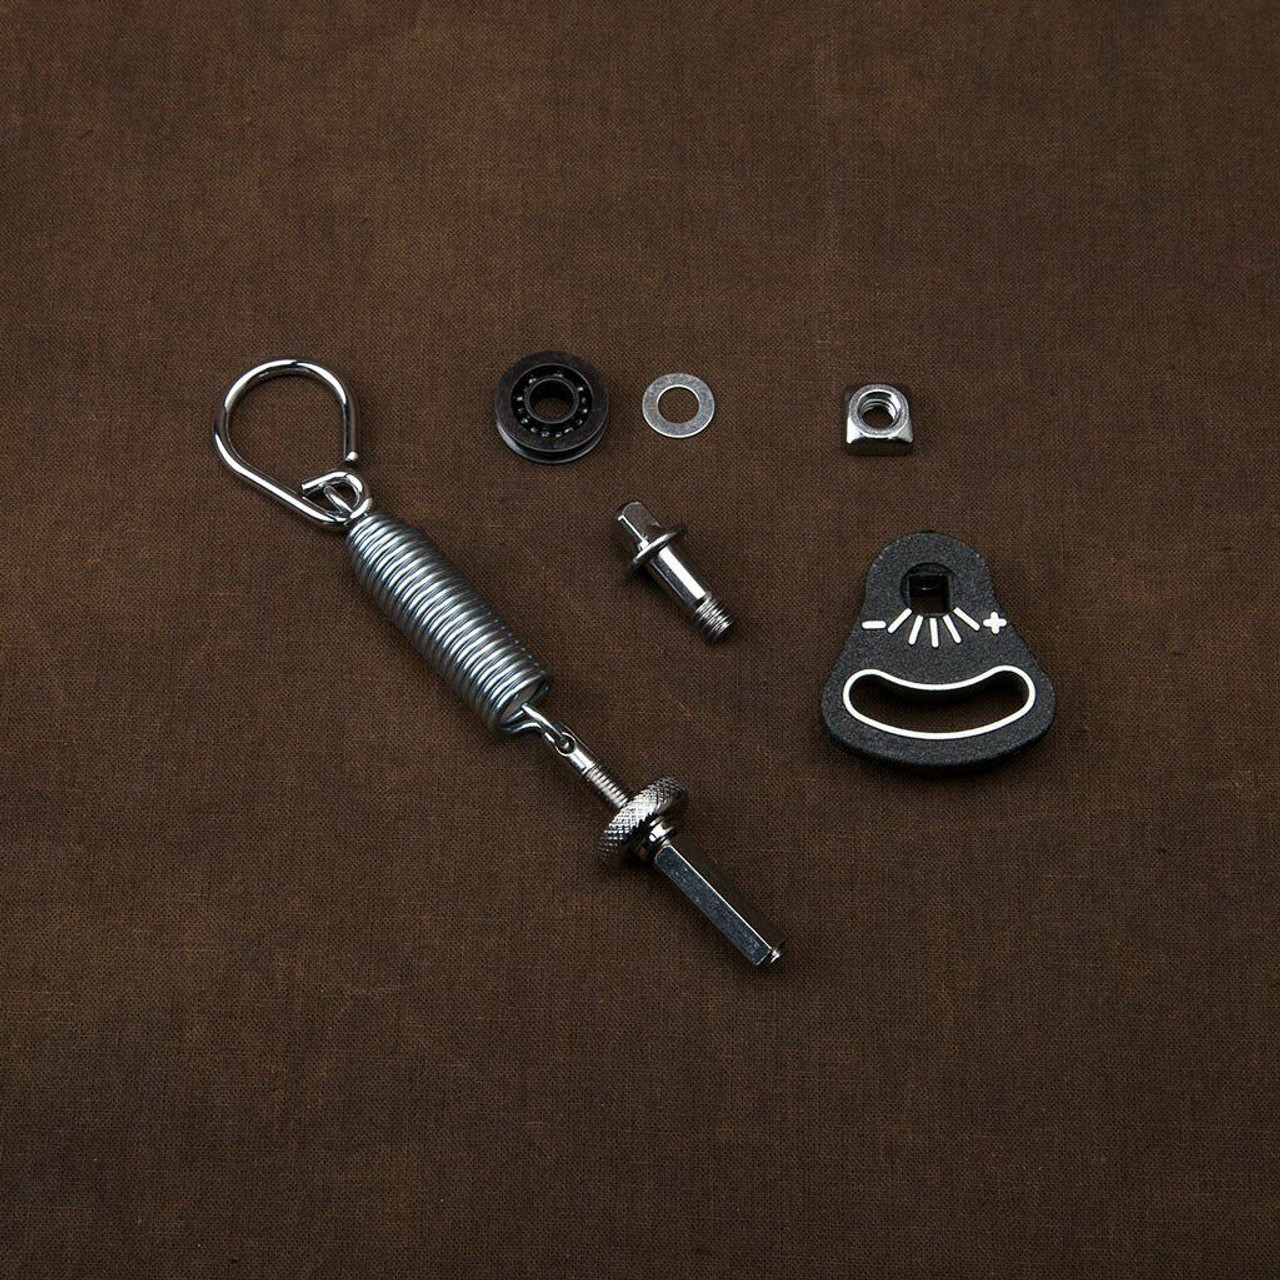 Drum Workshop 9002 Pedal to 2 9000 Pedalconversion Kit